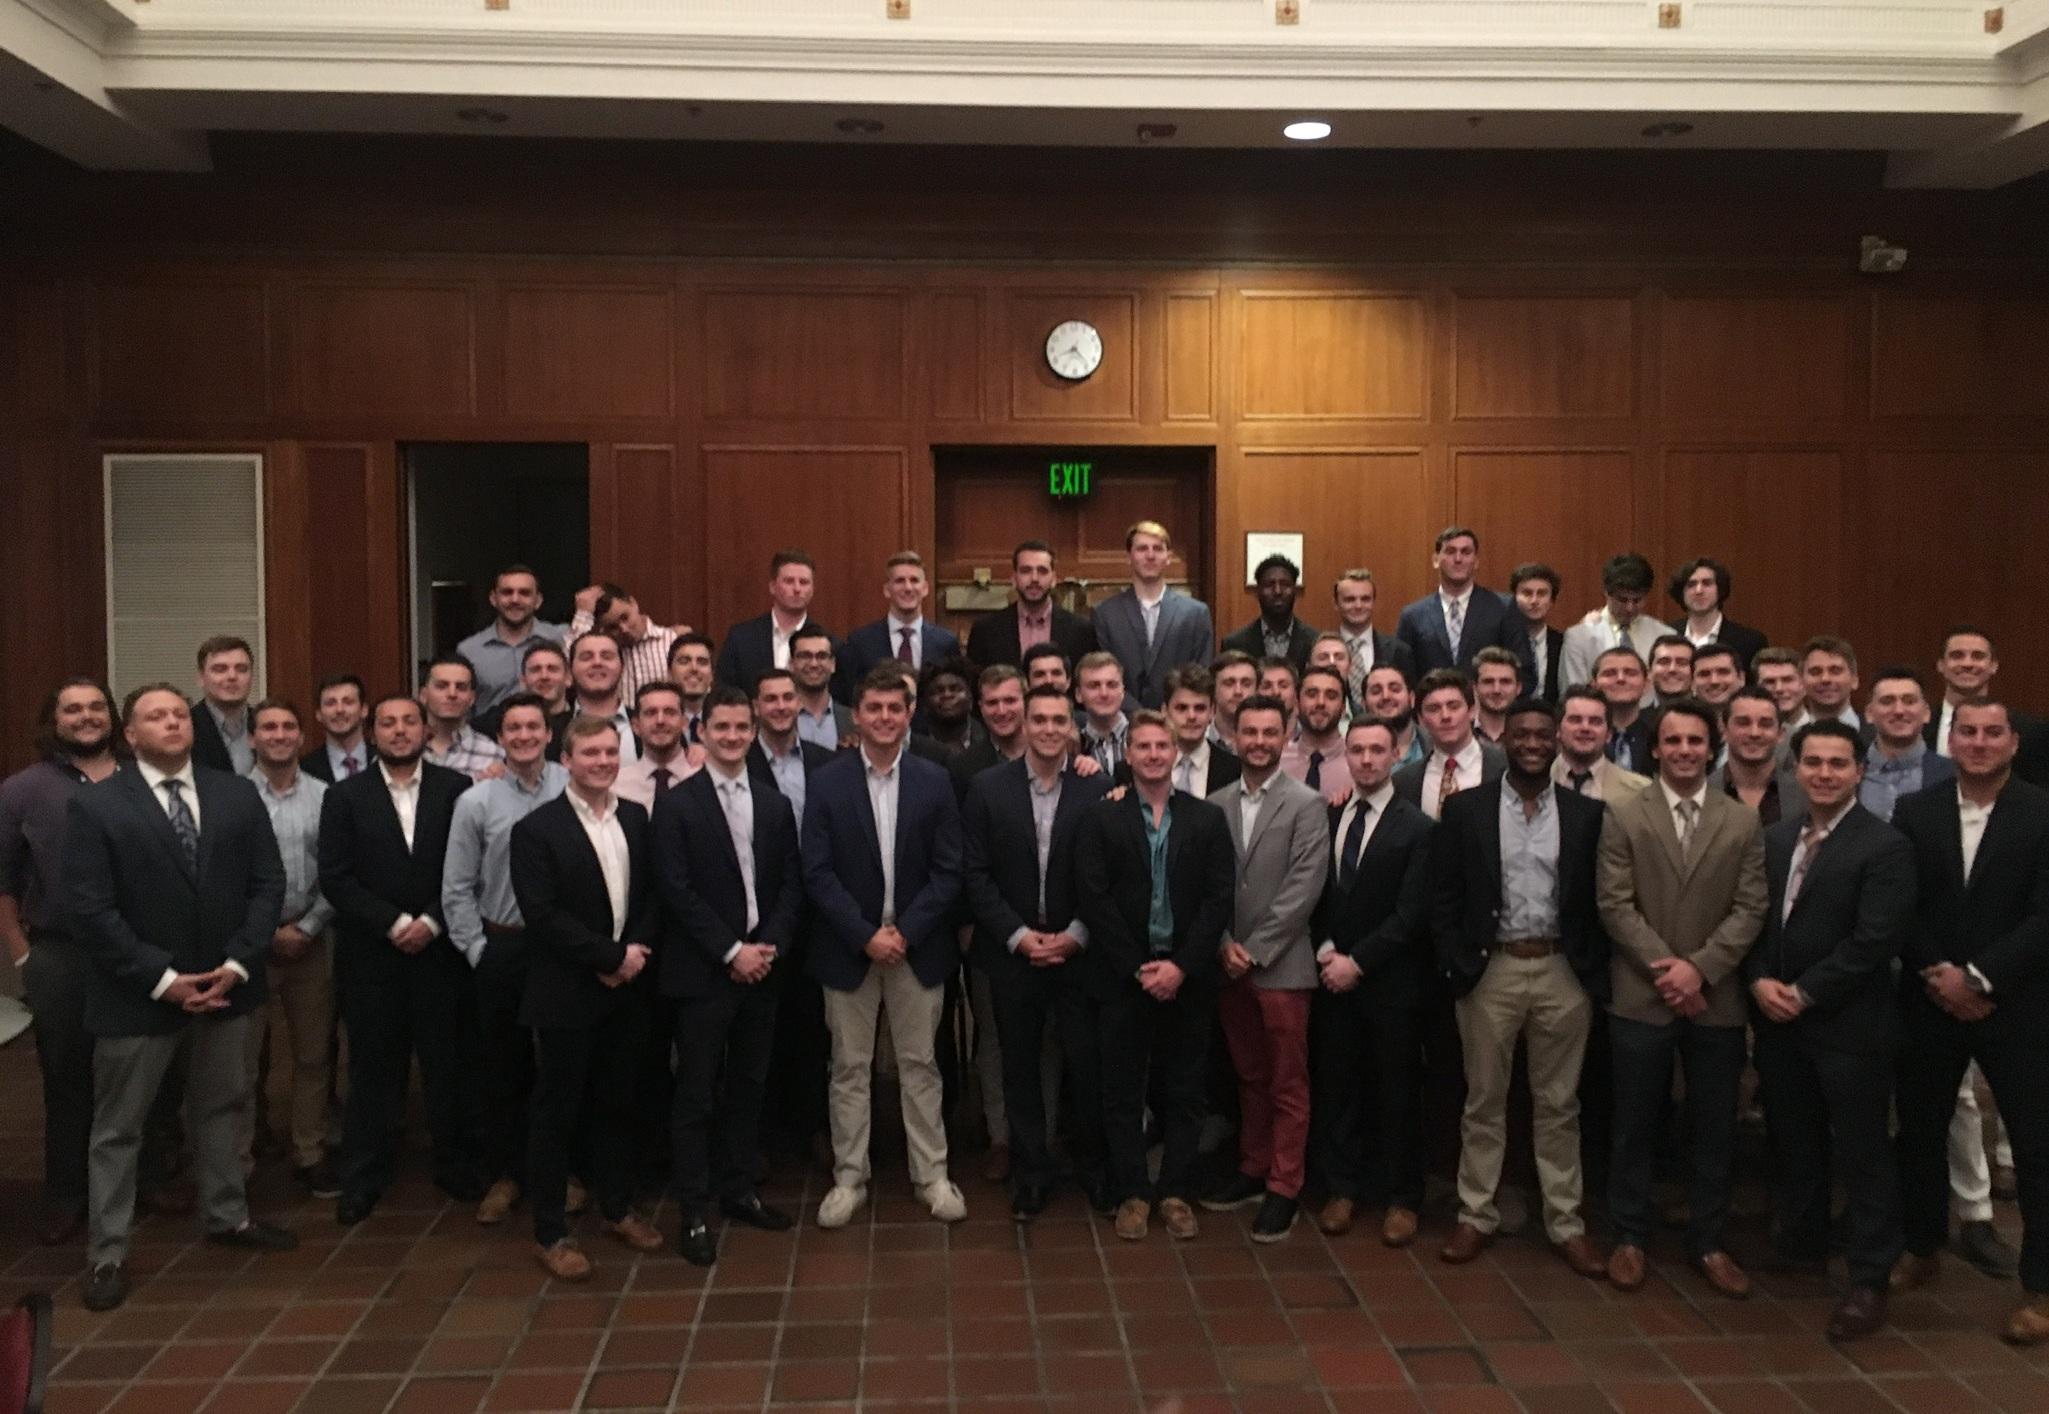 The 2018-2019 Salisbury University Kappa Sigma - Pi Sigma Chapter